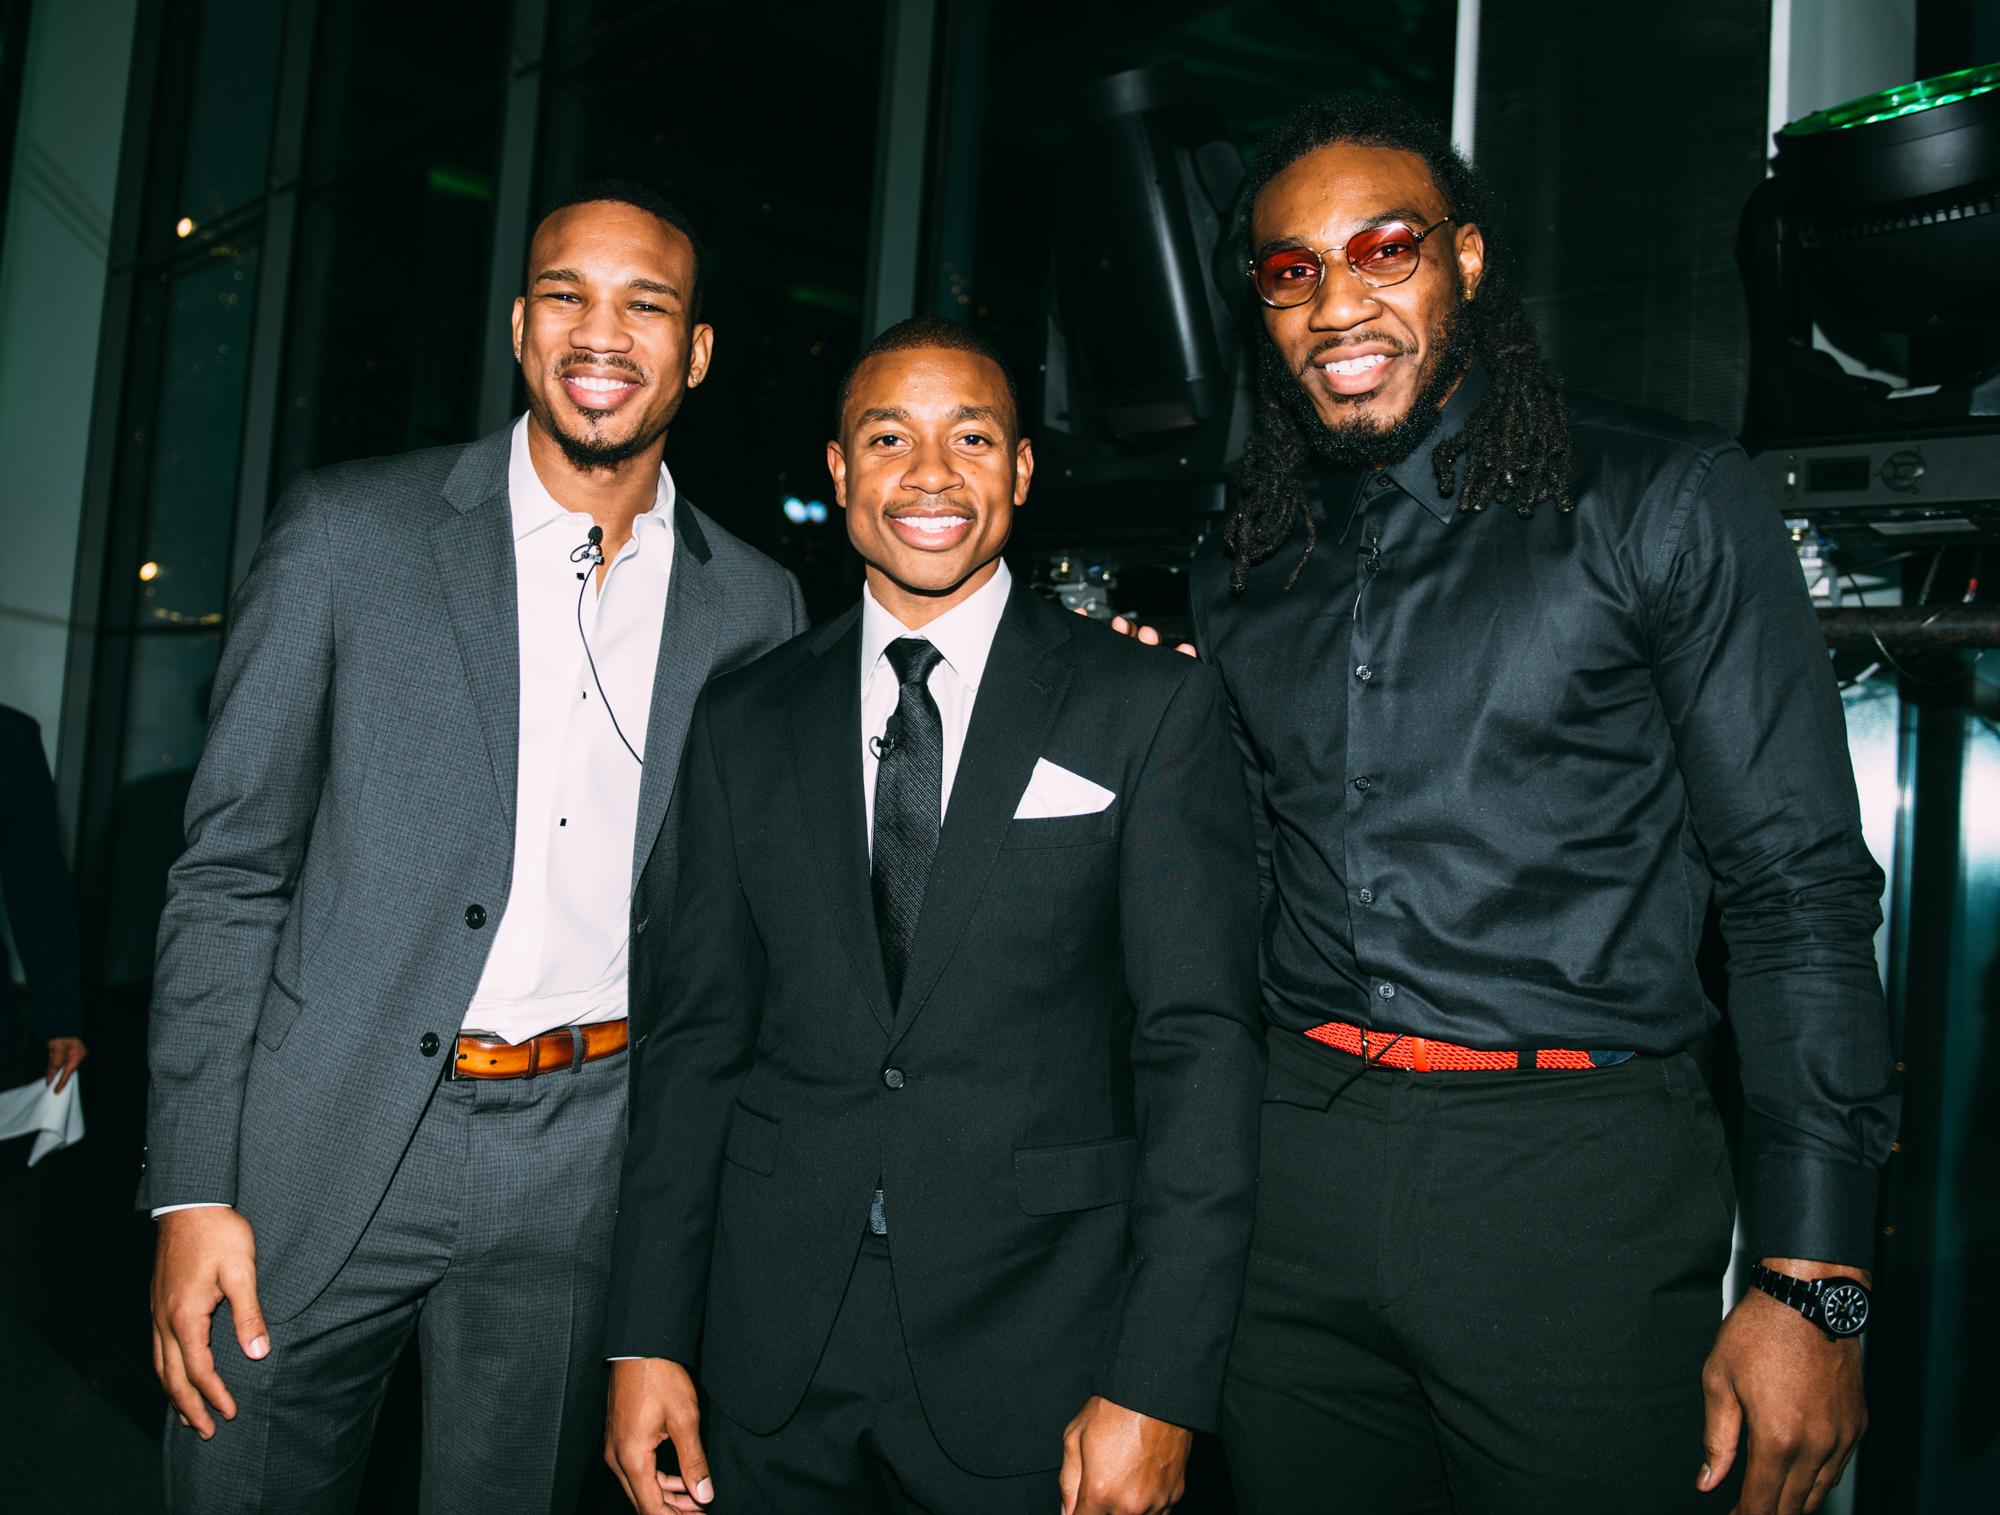 Avery Bradley, Isaiah Thomas and Jae Crowder